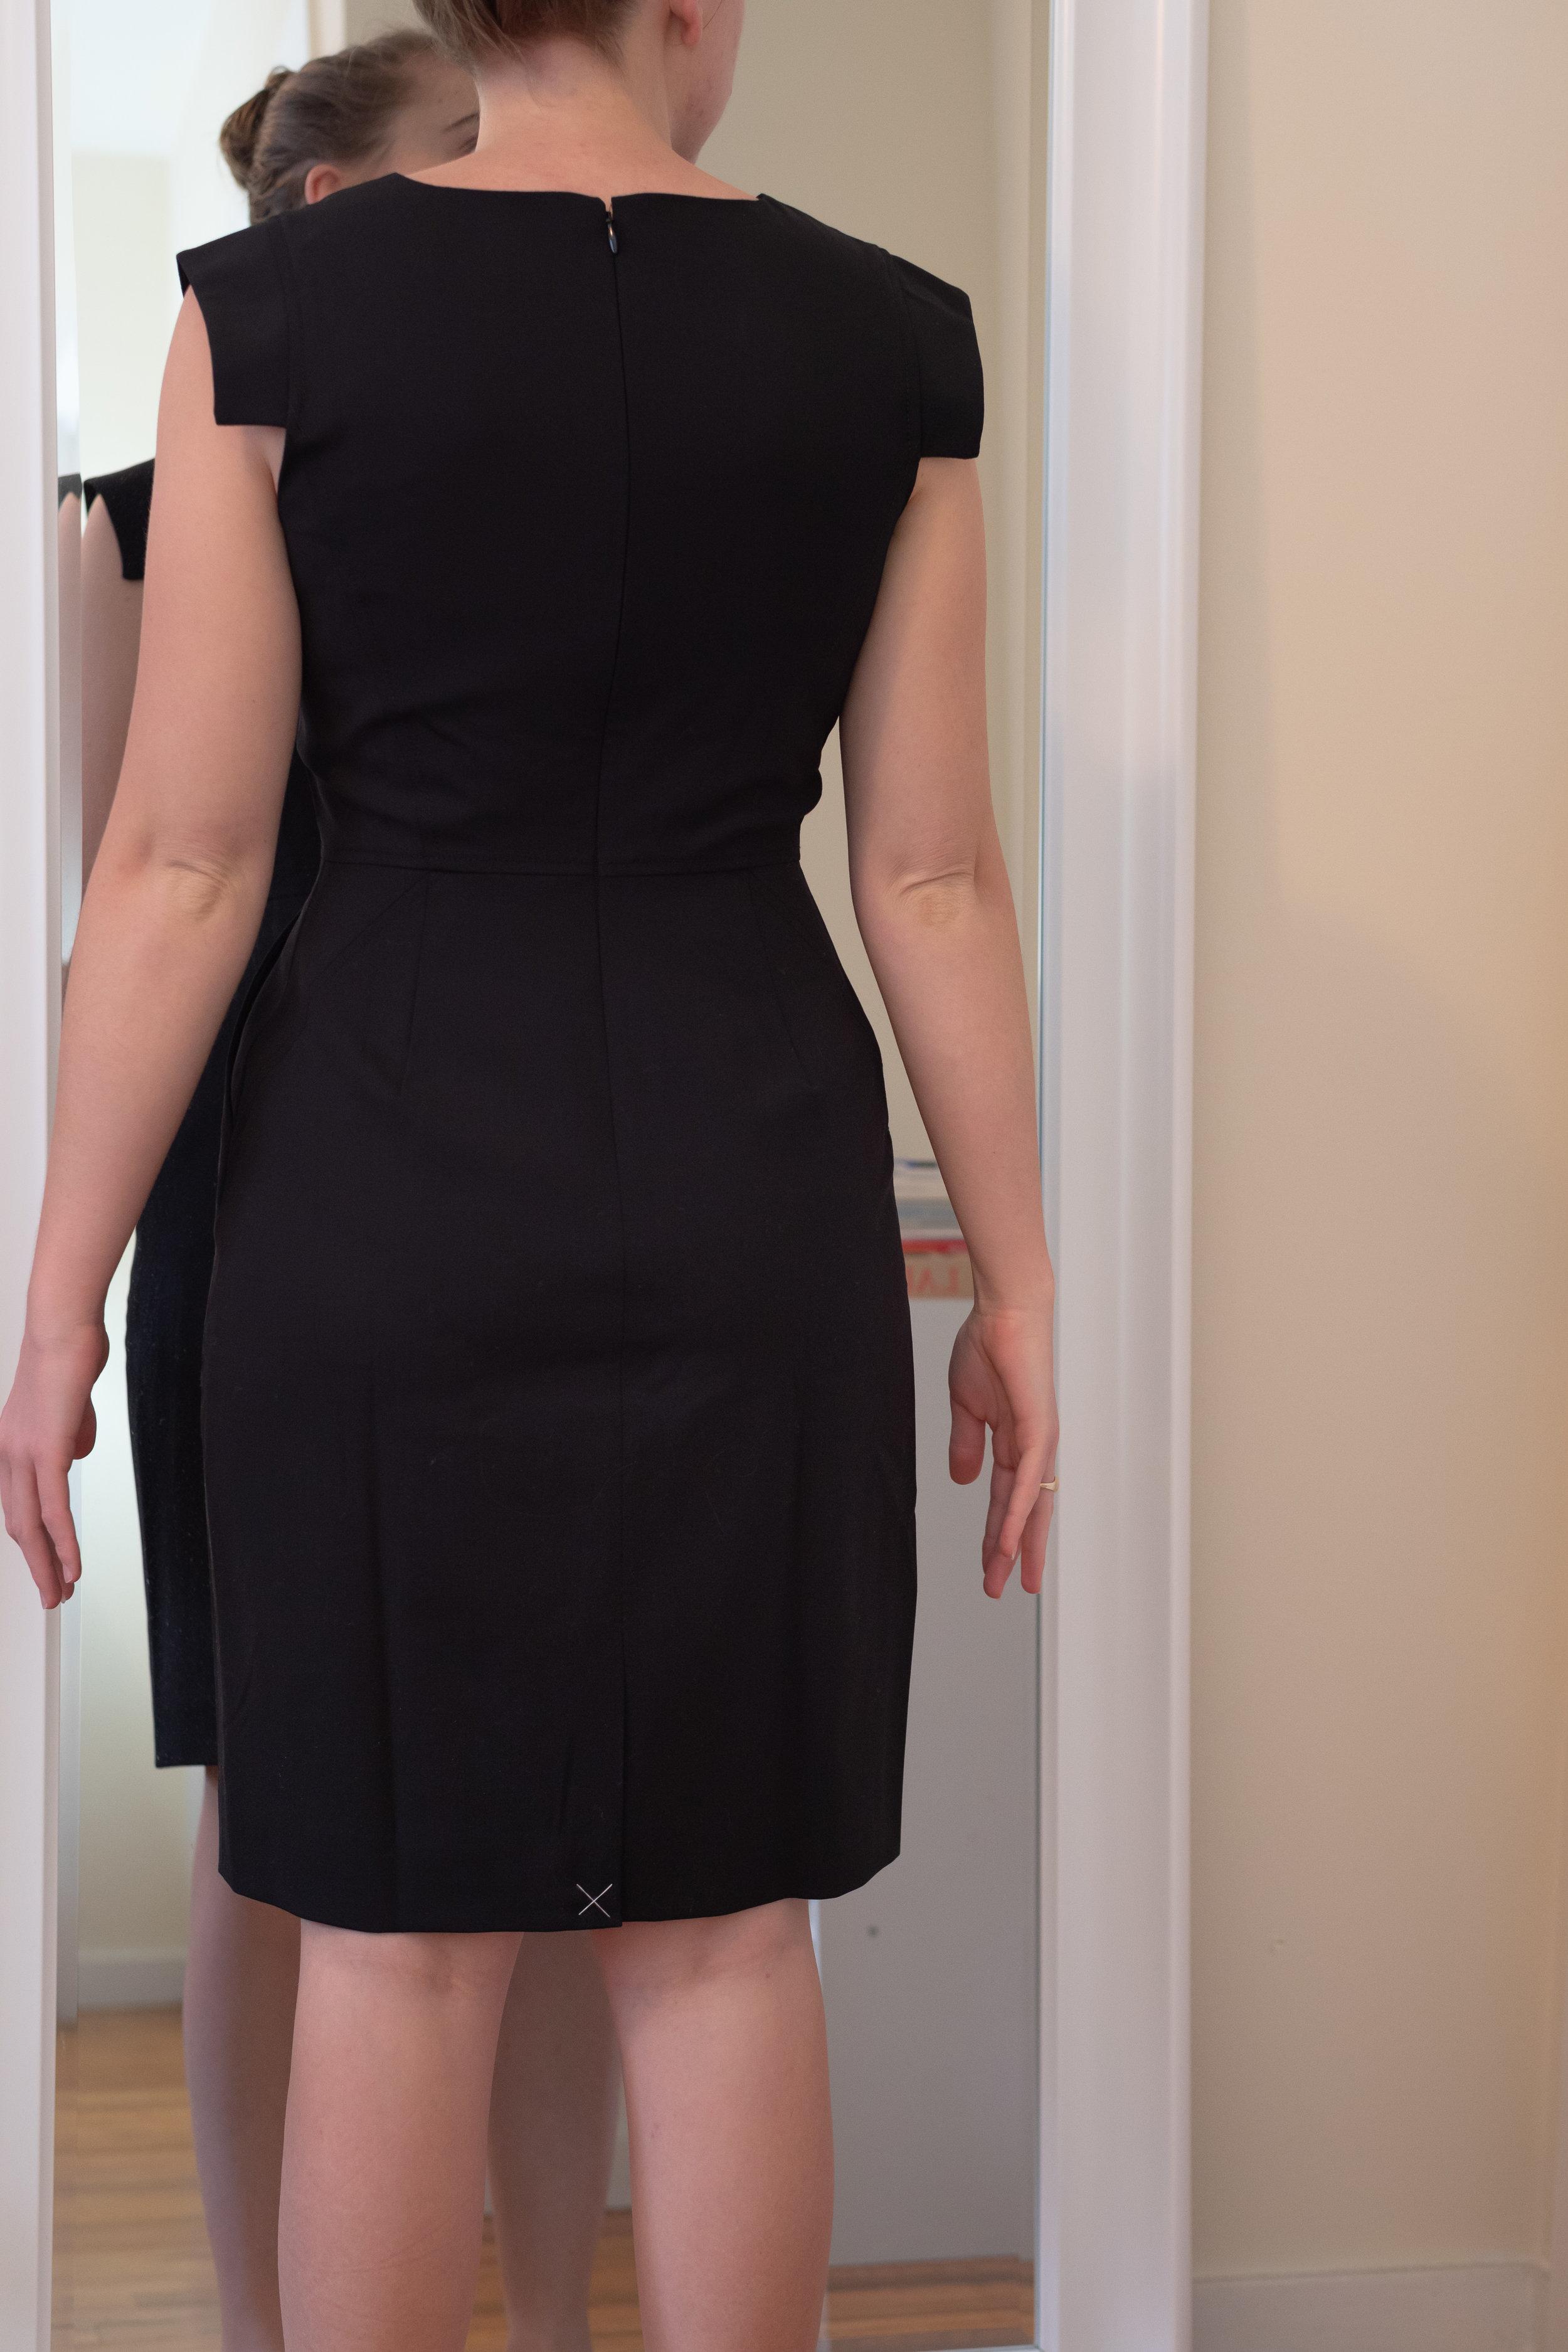 J.Crew Petite Resume Dress - Size 4 Petite